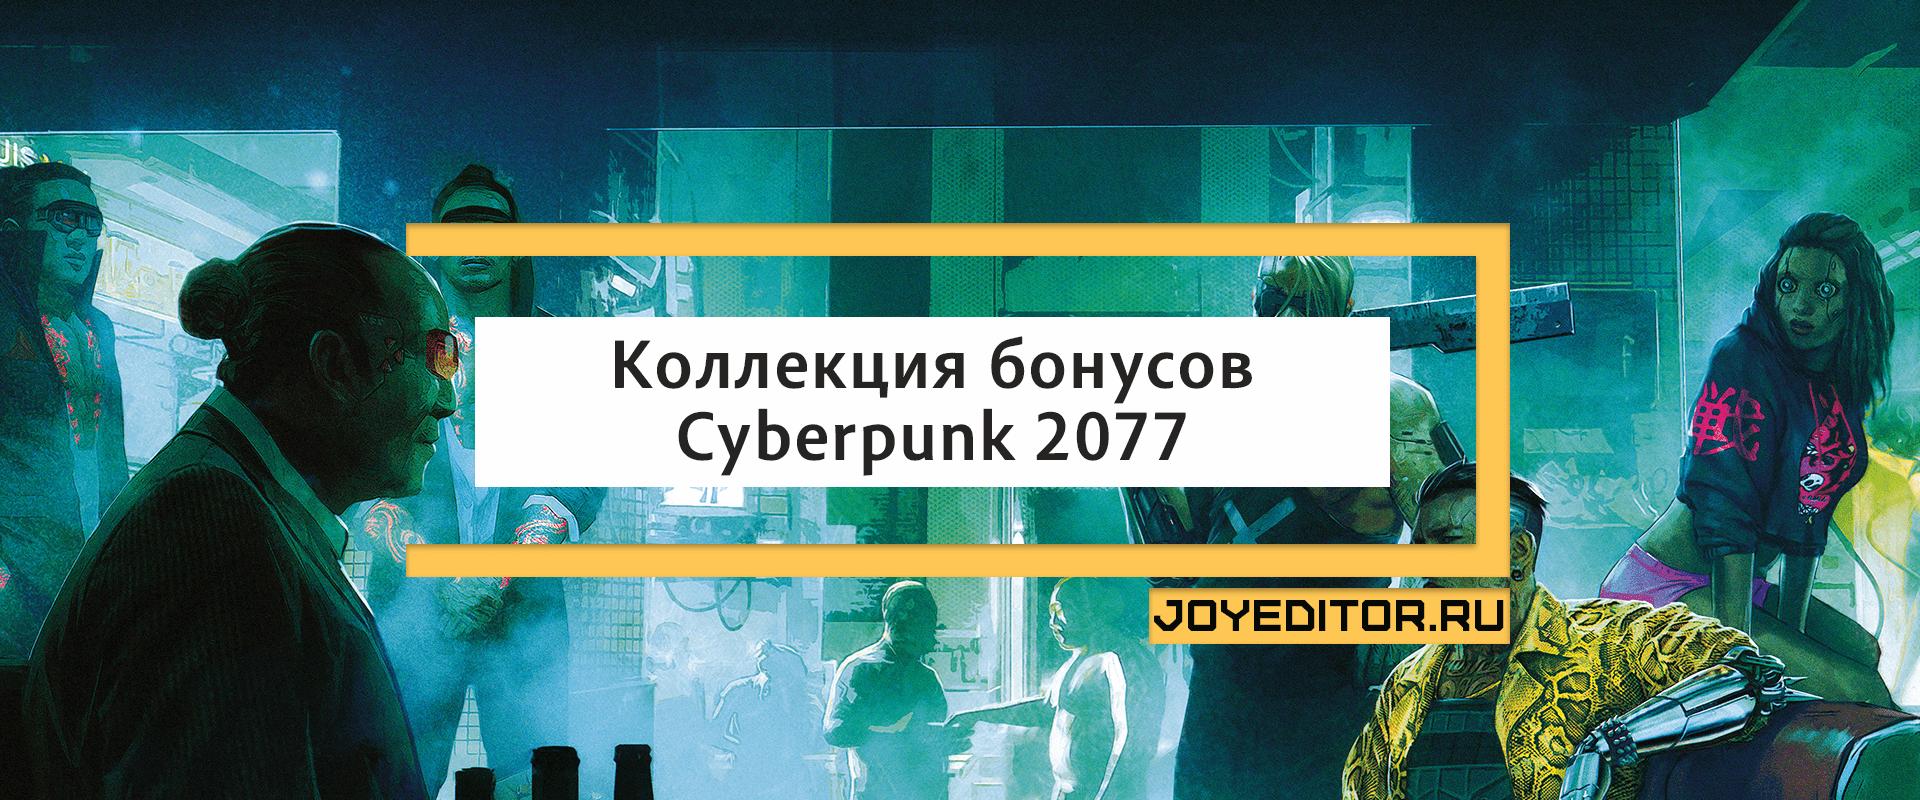 Коллекция бонусов Cyberpunk 2077